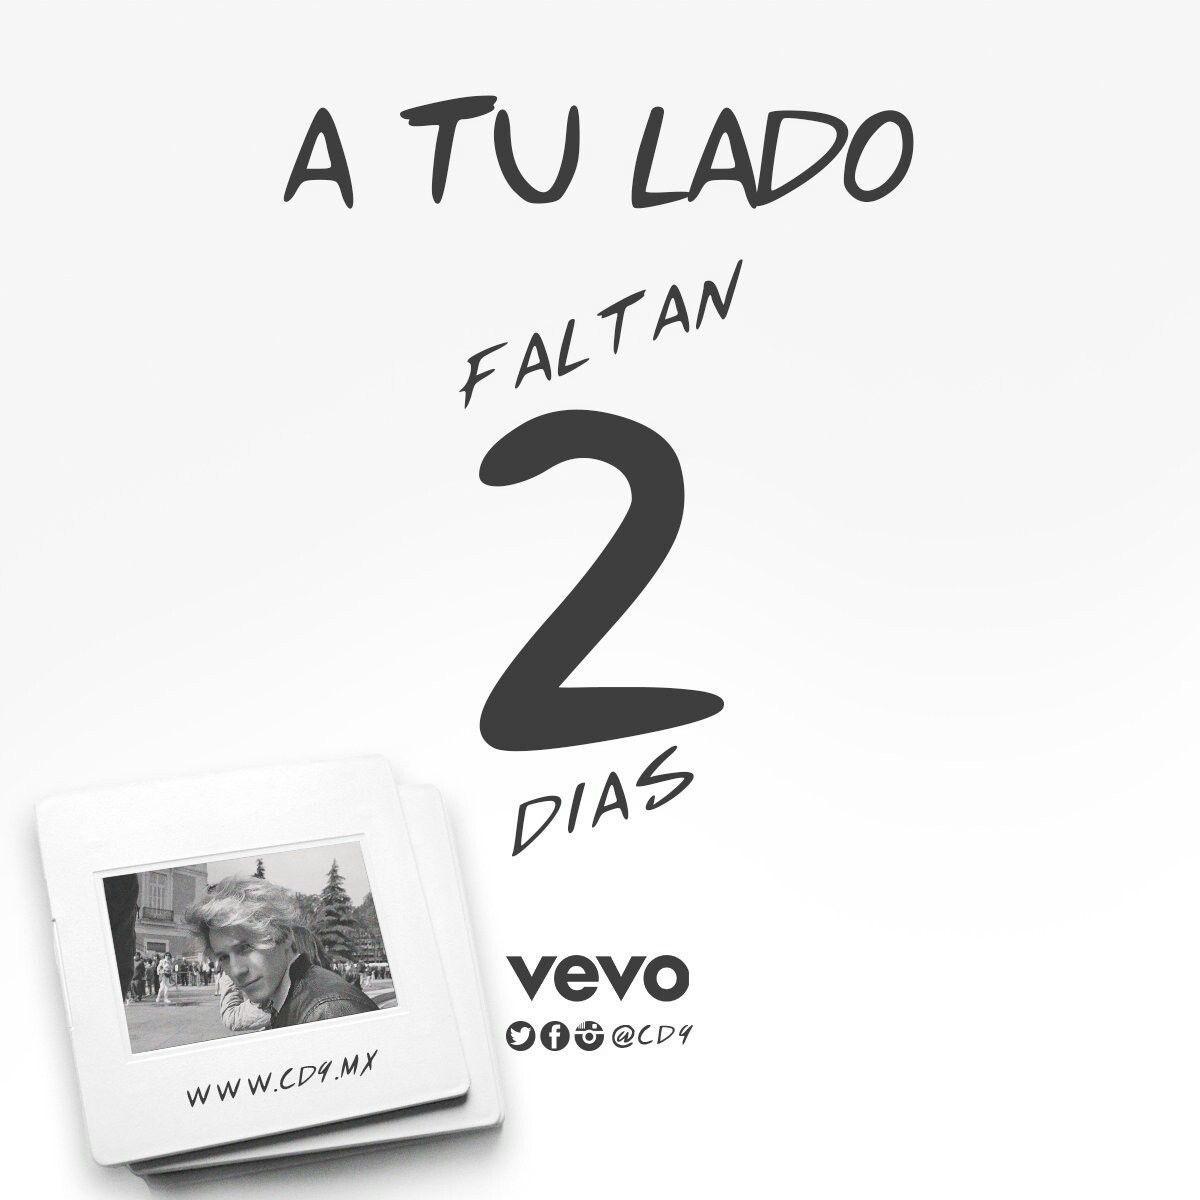 #ATuLado MUSIC VIDEO PREMIER 14/02